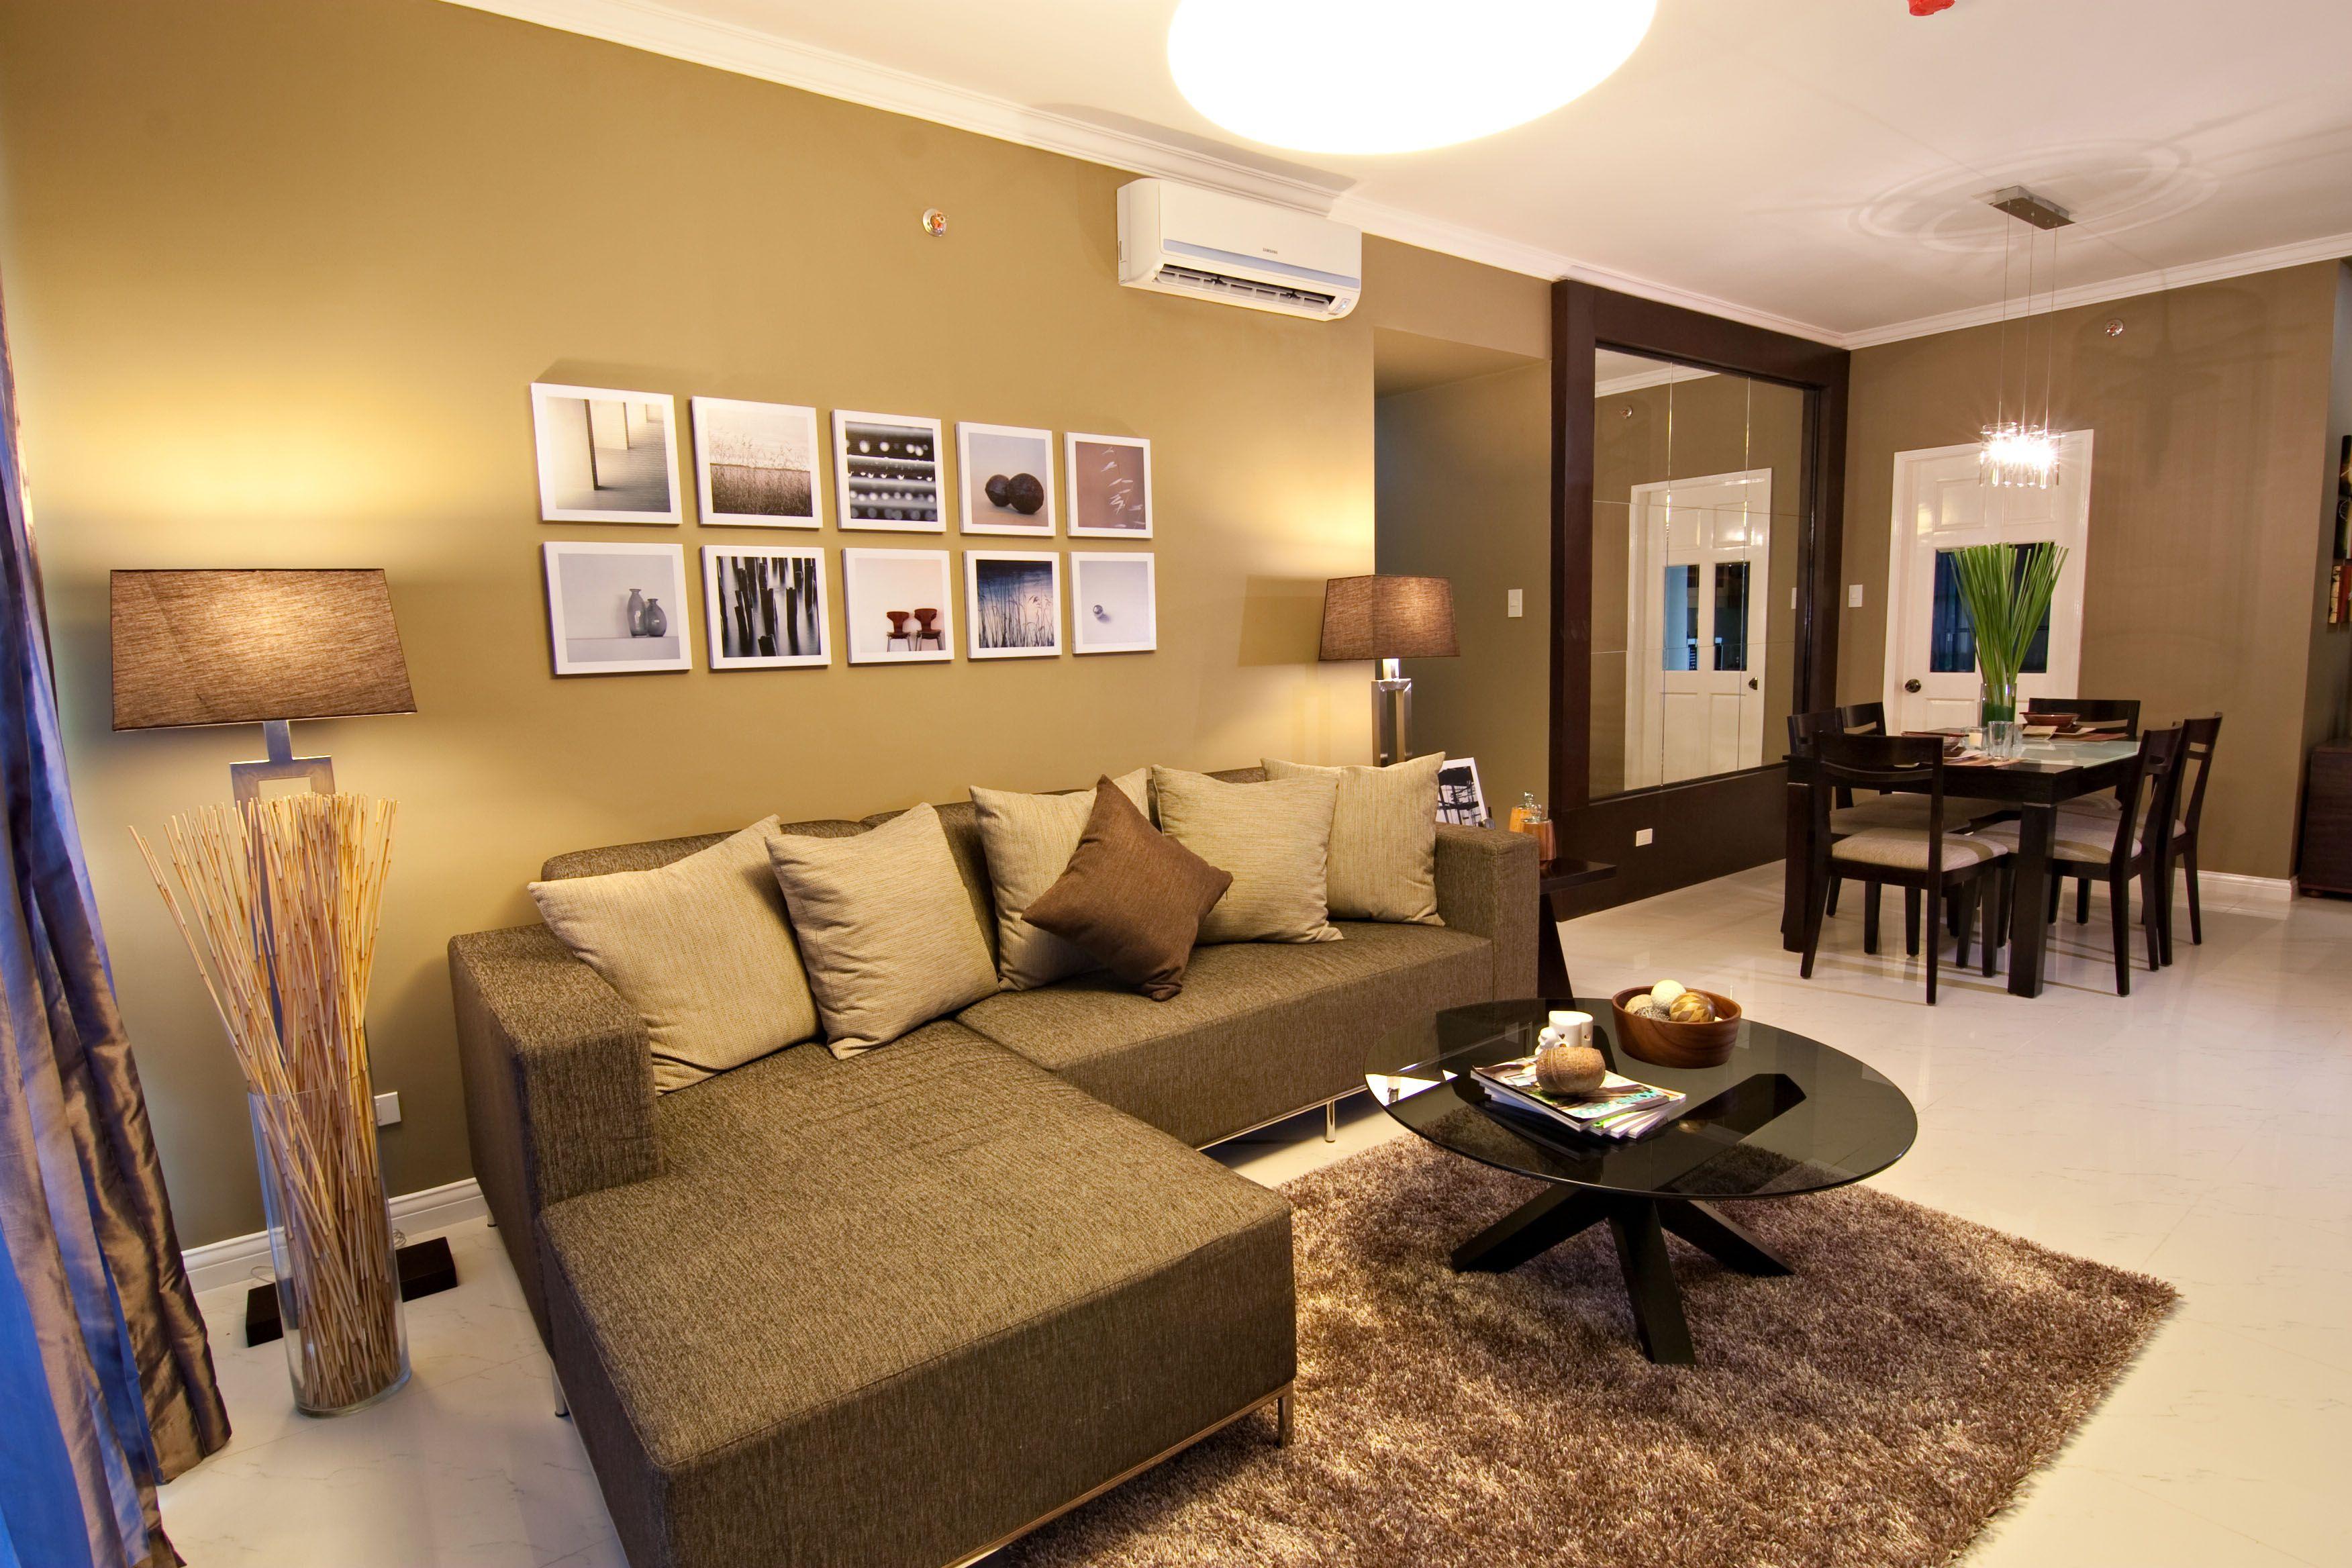 Condo Interior Design Ideas Part - 33: Citylights Garden Condominium By Adrian Del Monte At Coroflot.com · Condo  Interior DesignWarm ...